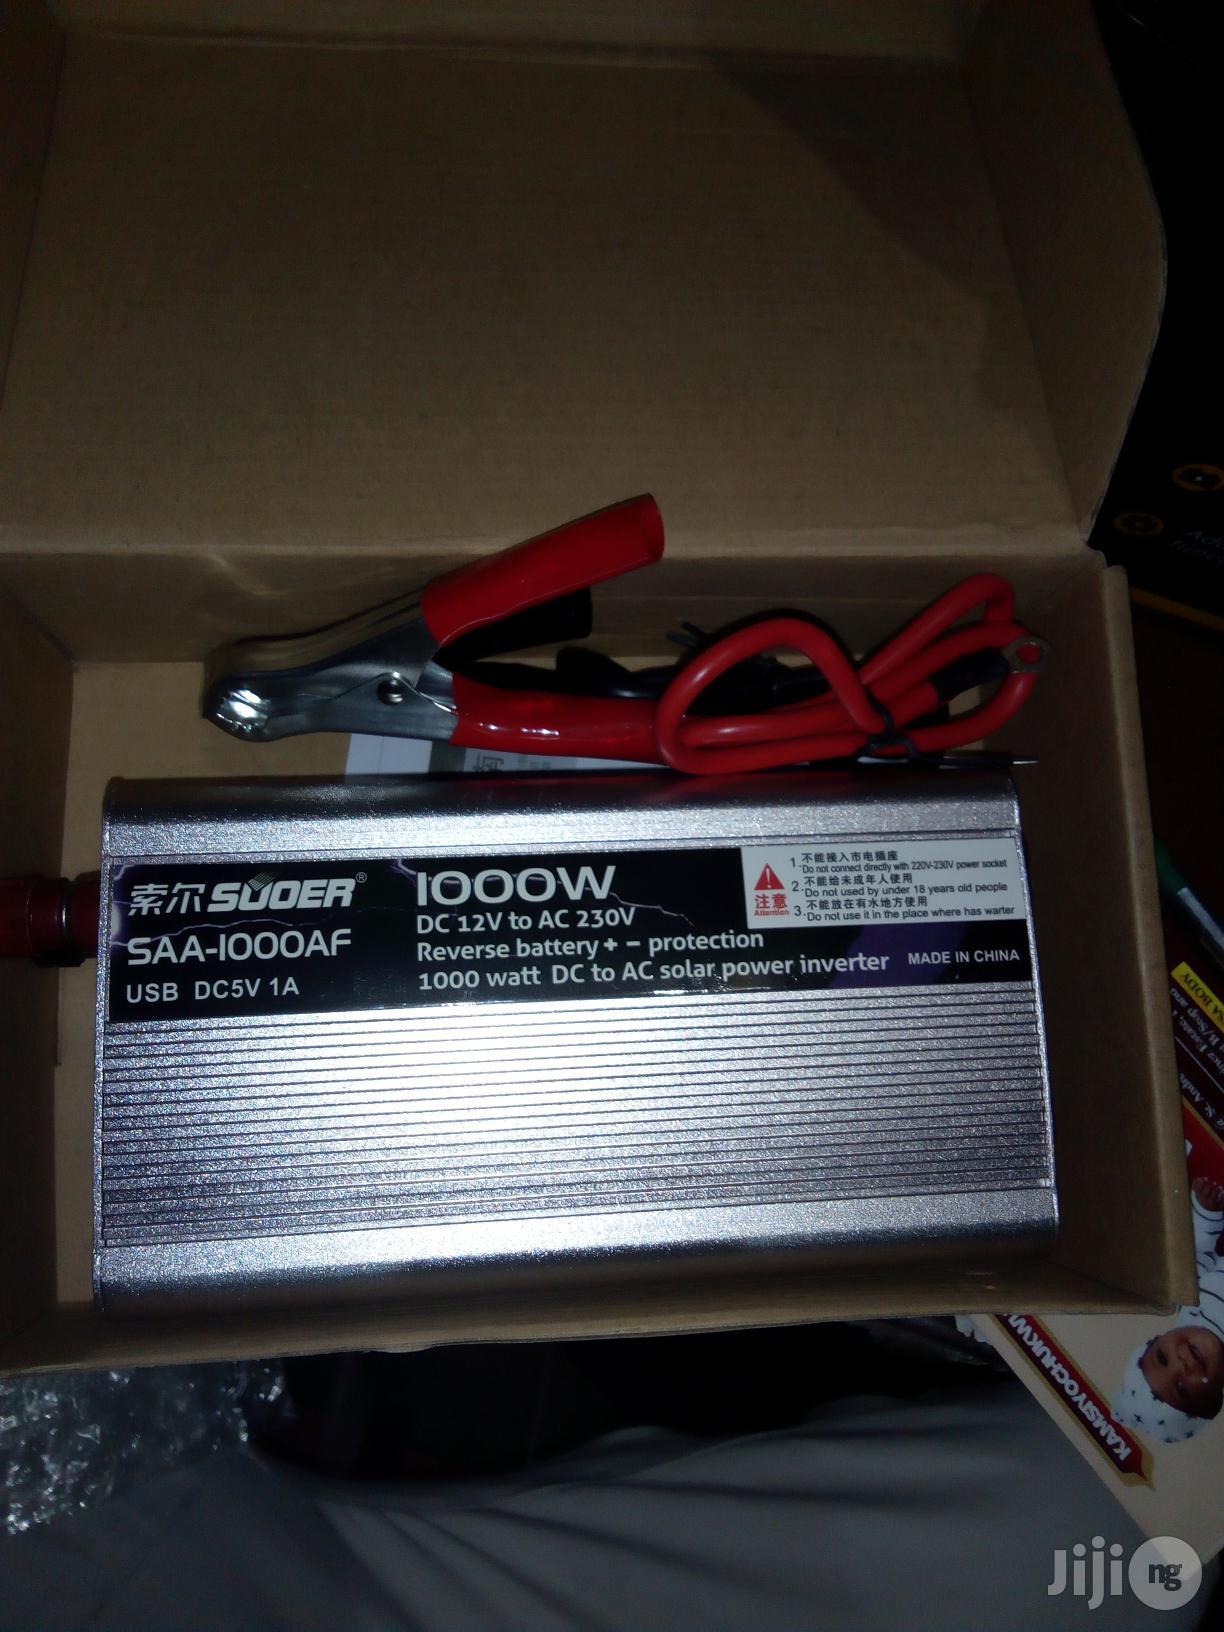 1000 Watt Souer Inverter Available